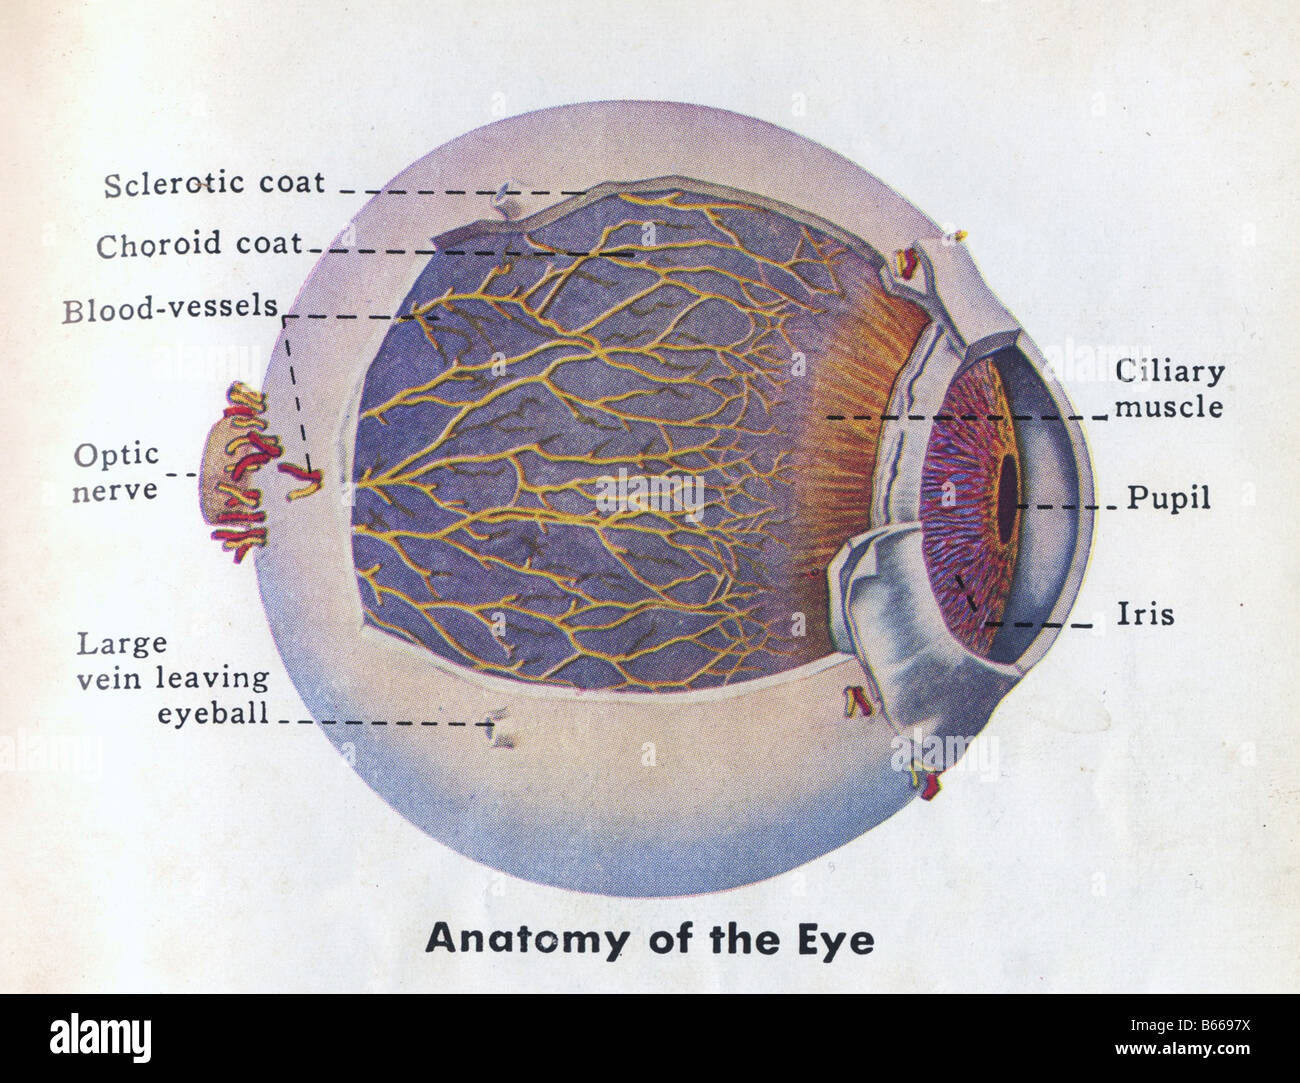 Human Eye Diagram Imágenes De Stock & Human Eye Diagram Fotos De ...